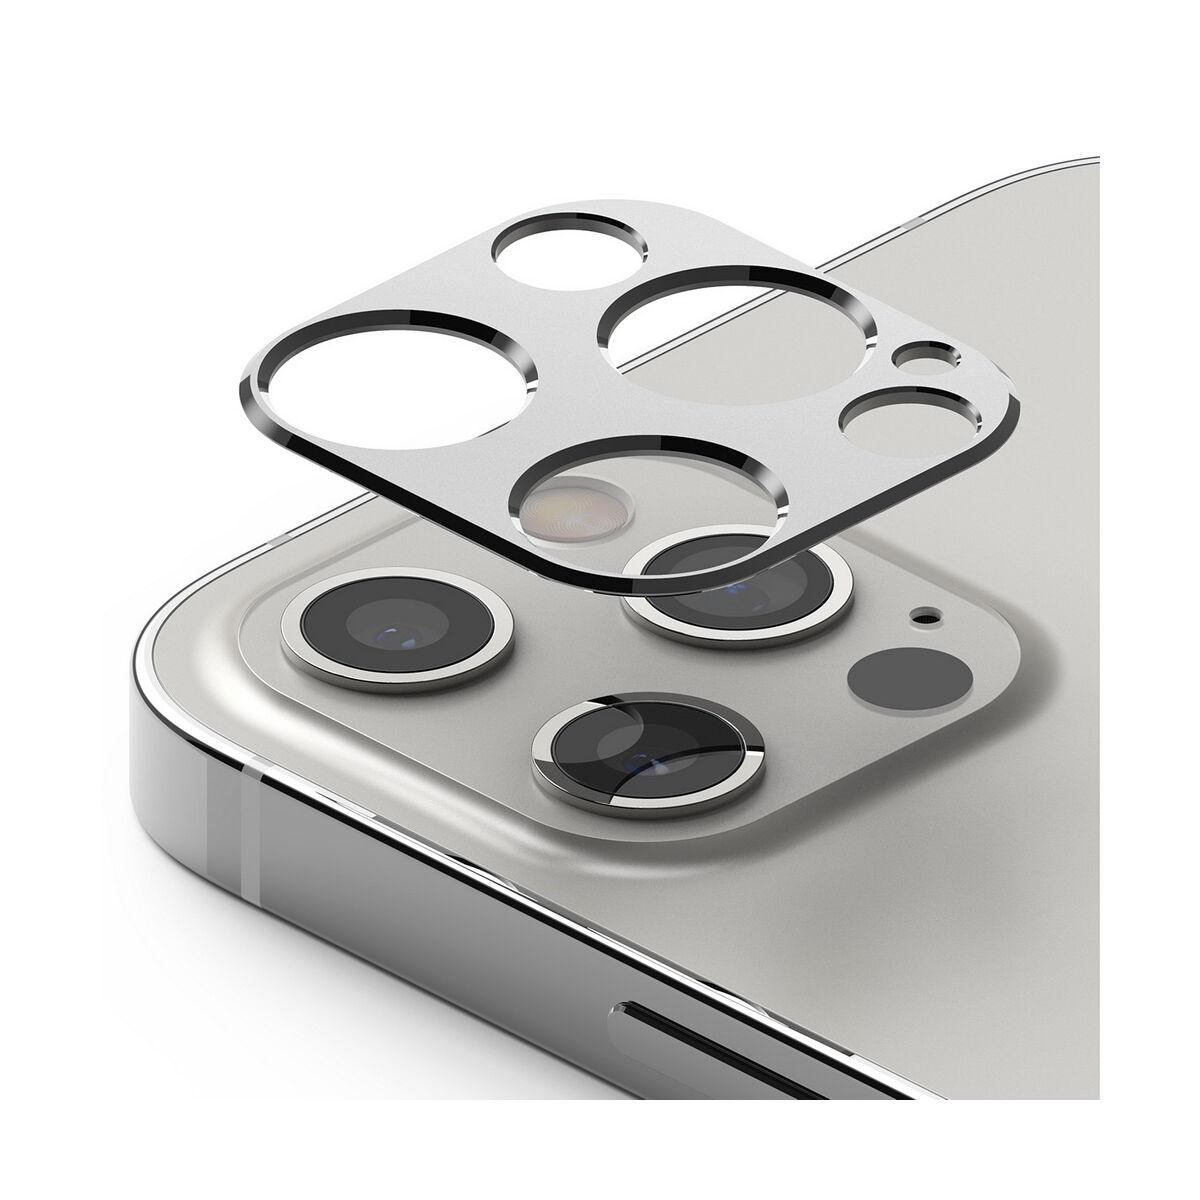 Ringke iPhone 12 Pro/12 Pro Max, Camera Stlying, kamera sizget védő keret, Ezüst